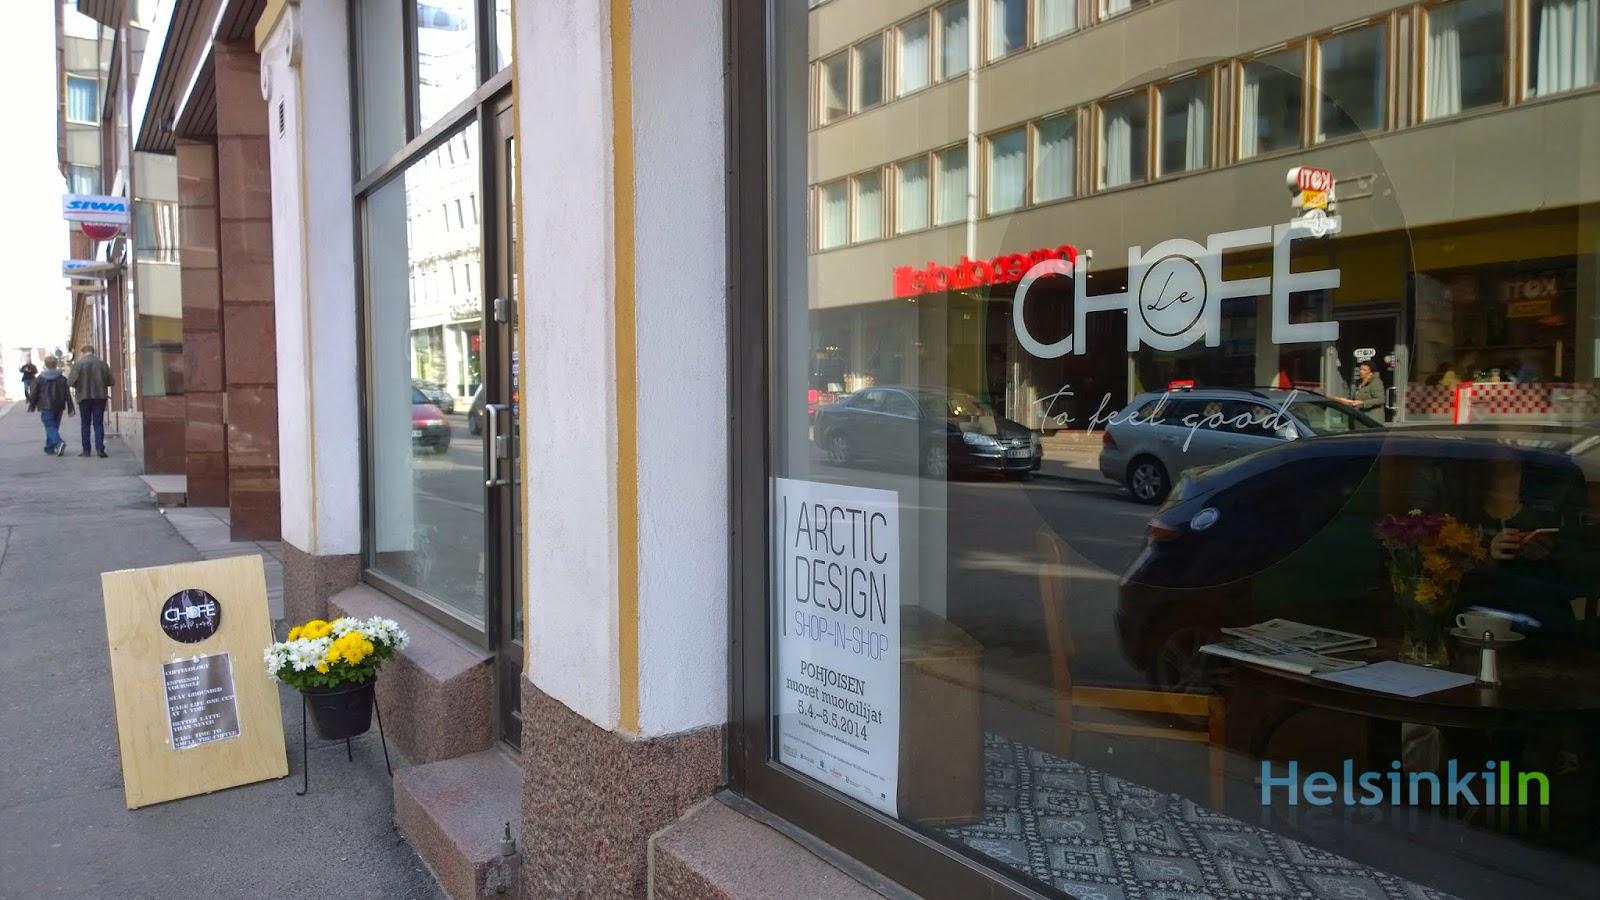 Café Chofé in Lönnrotinkatu